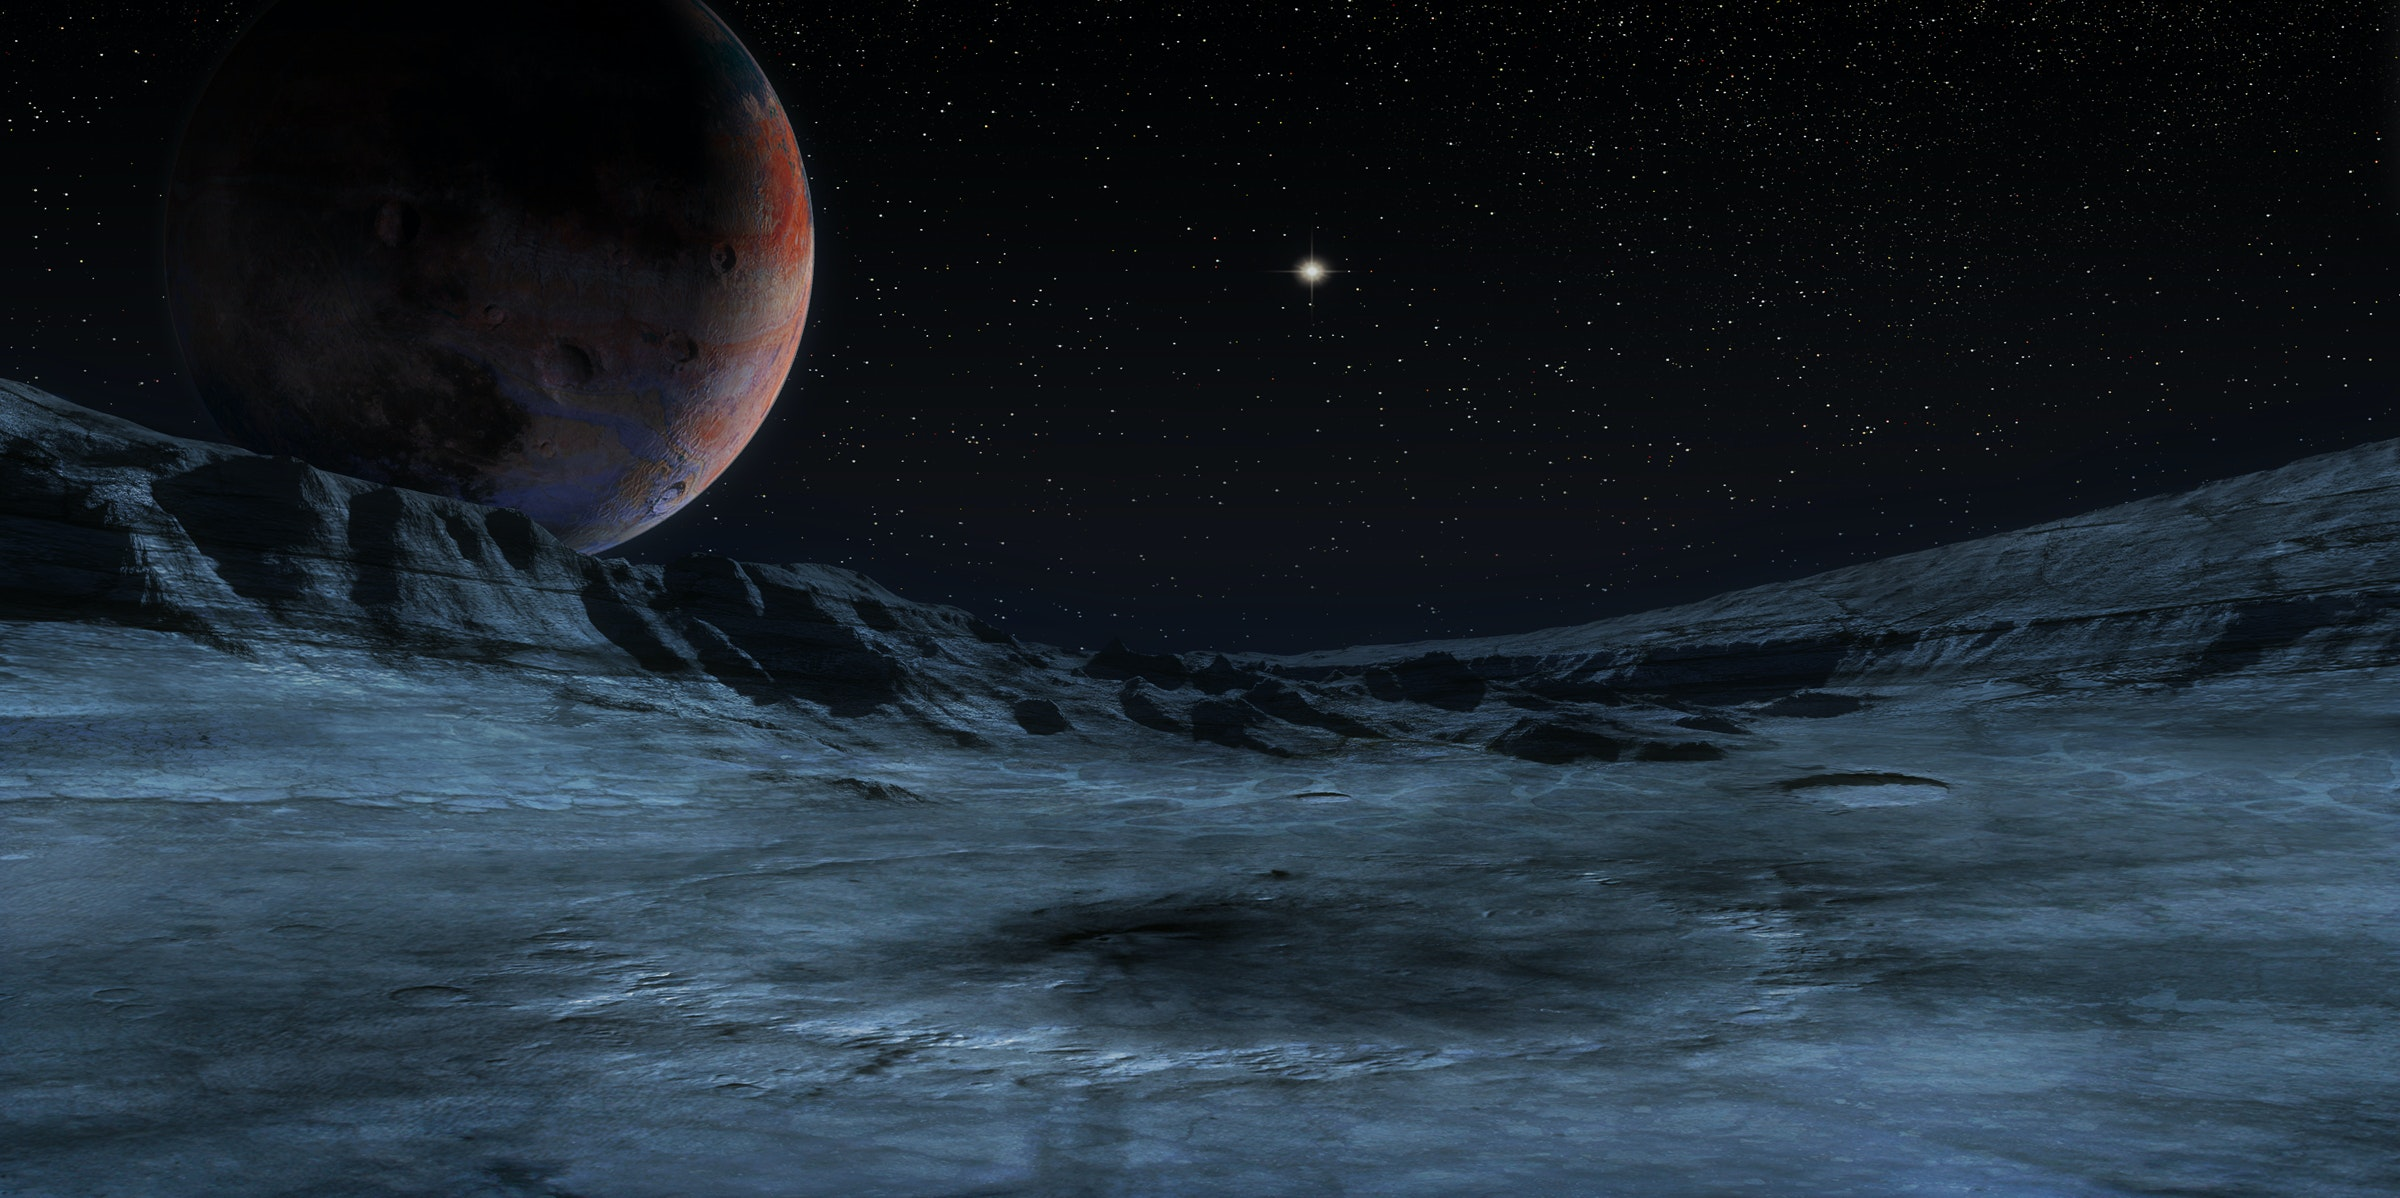 Pluto Pictures - Photos of Dwarf Planet Pluto